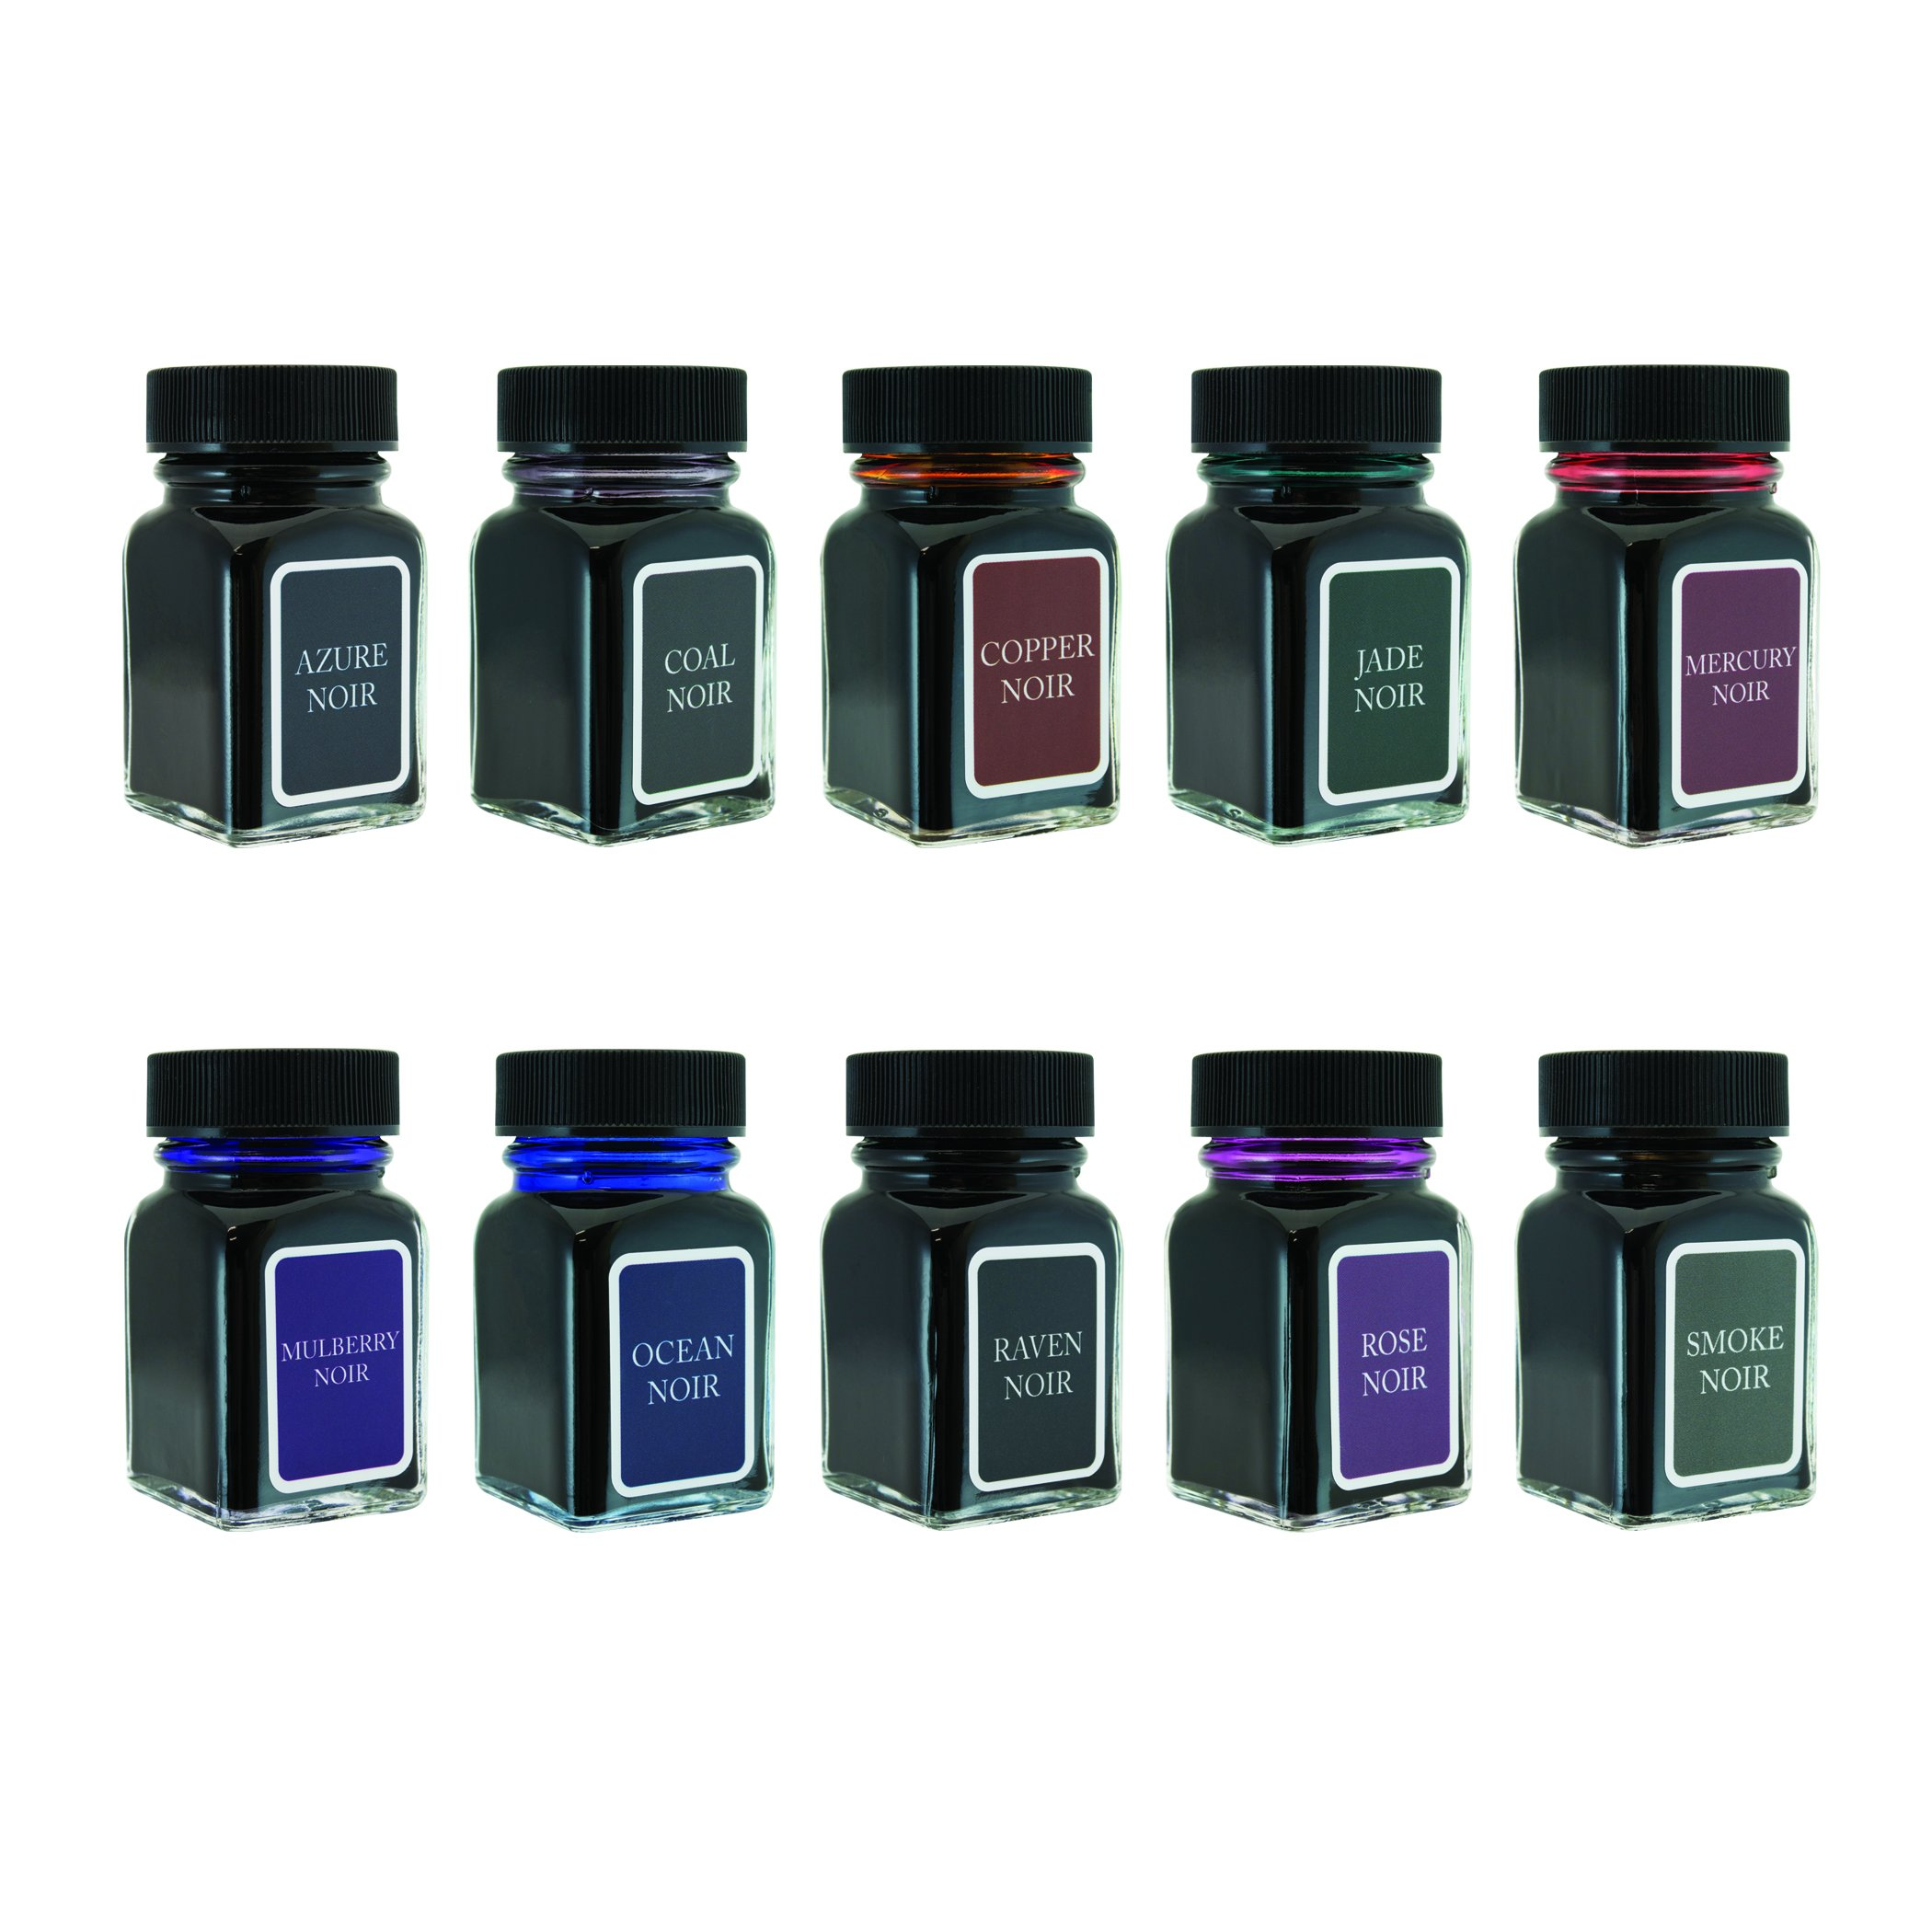 MONTEVERDE Noir Ink Collection Gift Set Fountain Pen Refill, Various Colors (MV12374) by Monteverde (Image #3)